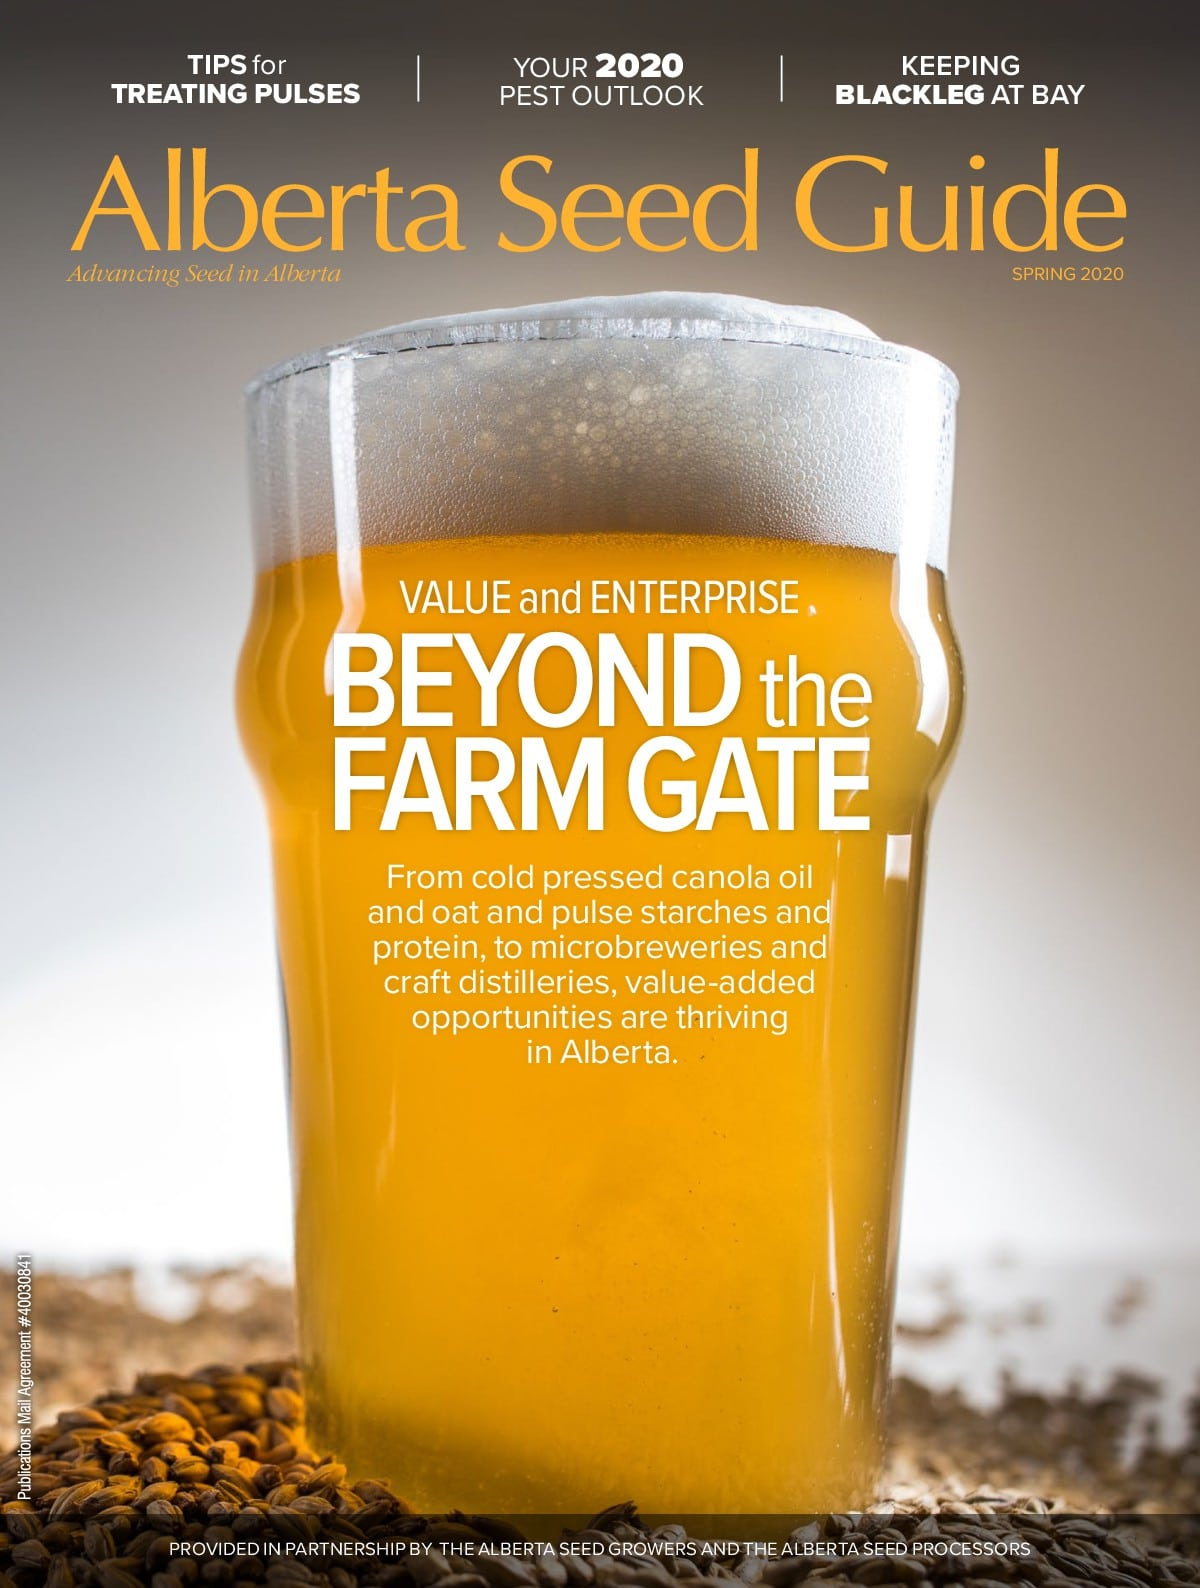 Spring 2020 – Value and Enterprise Beyond the Farm Gate